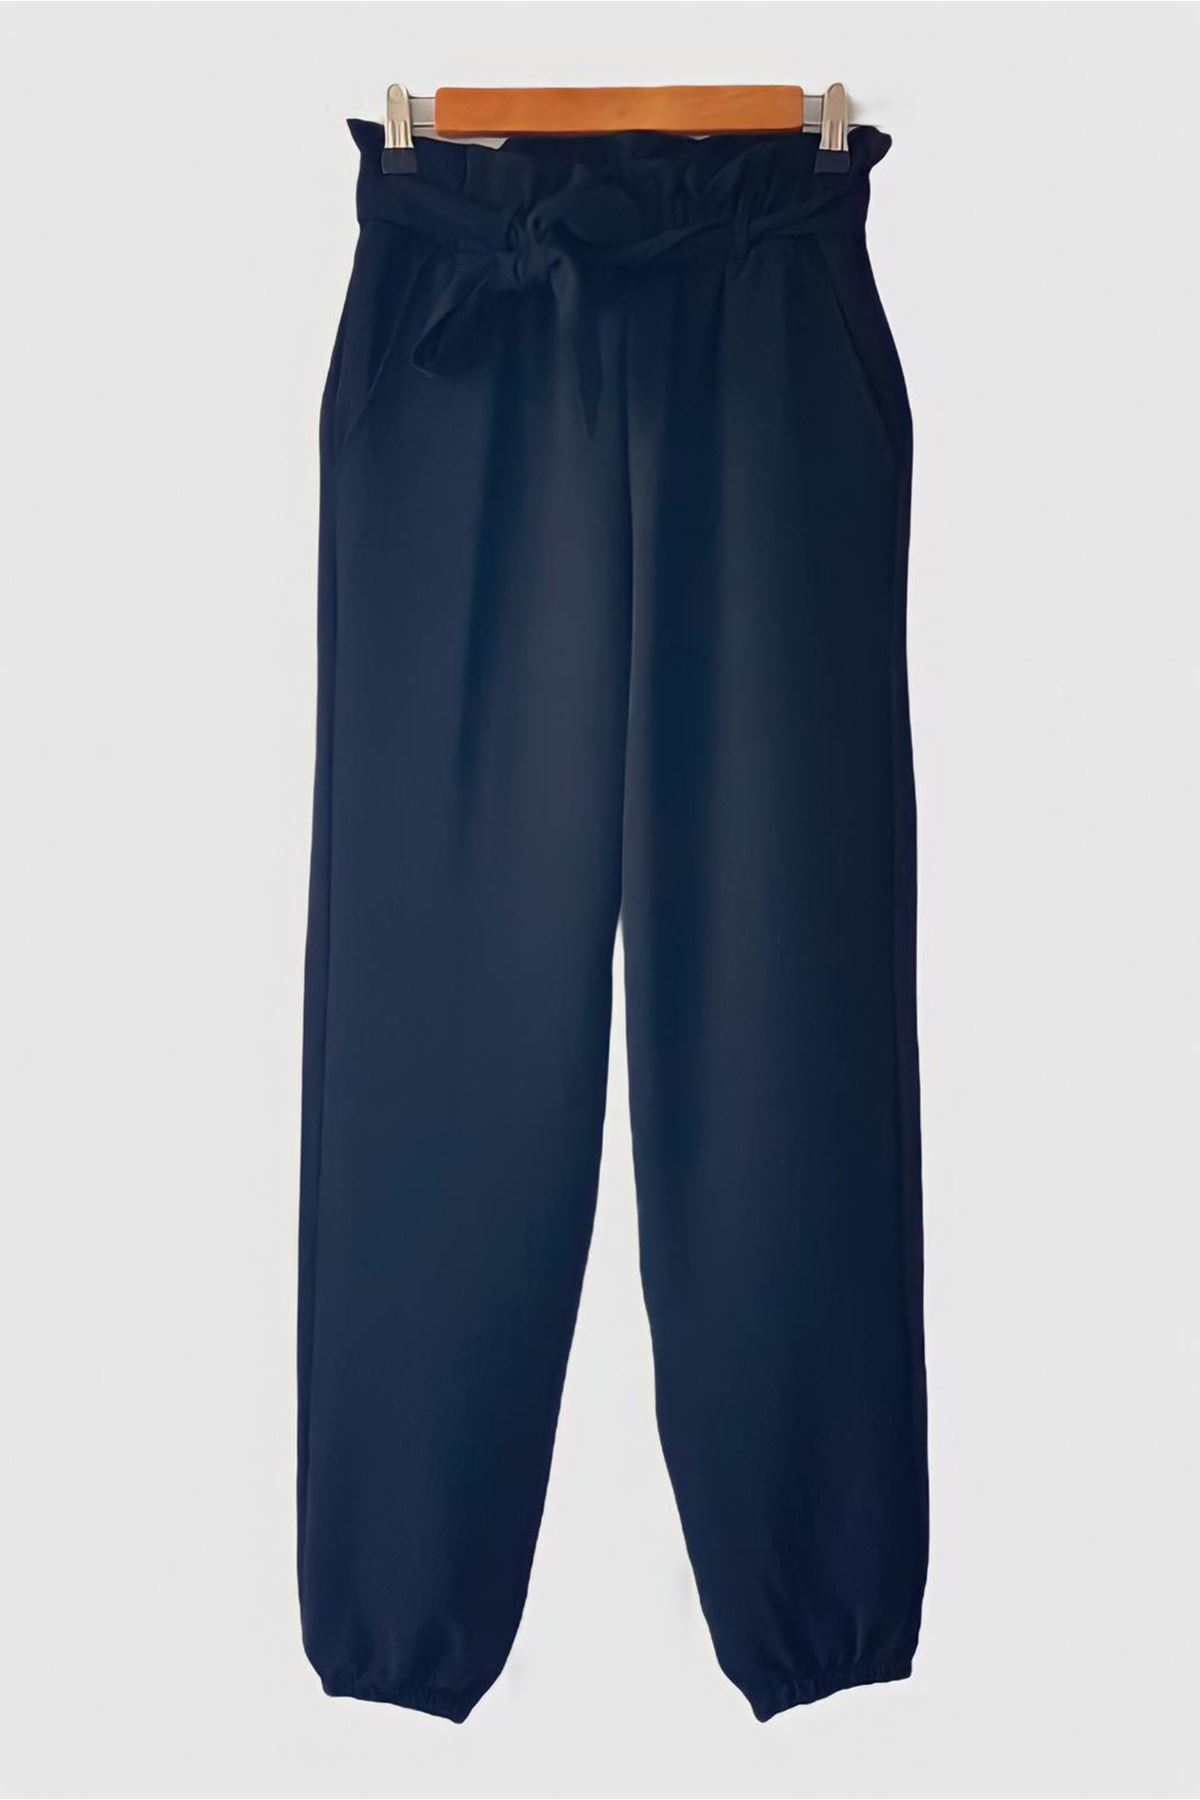 Kuşak Detaylı Jogger Pantolon - SİYAH